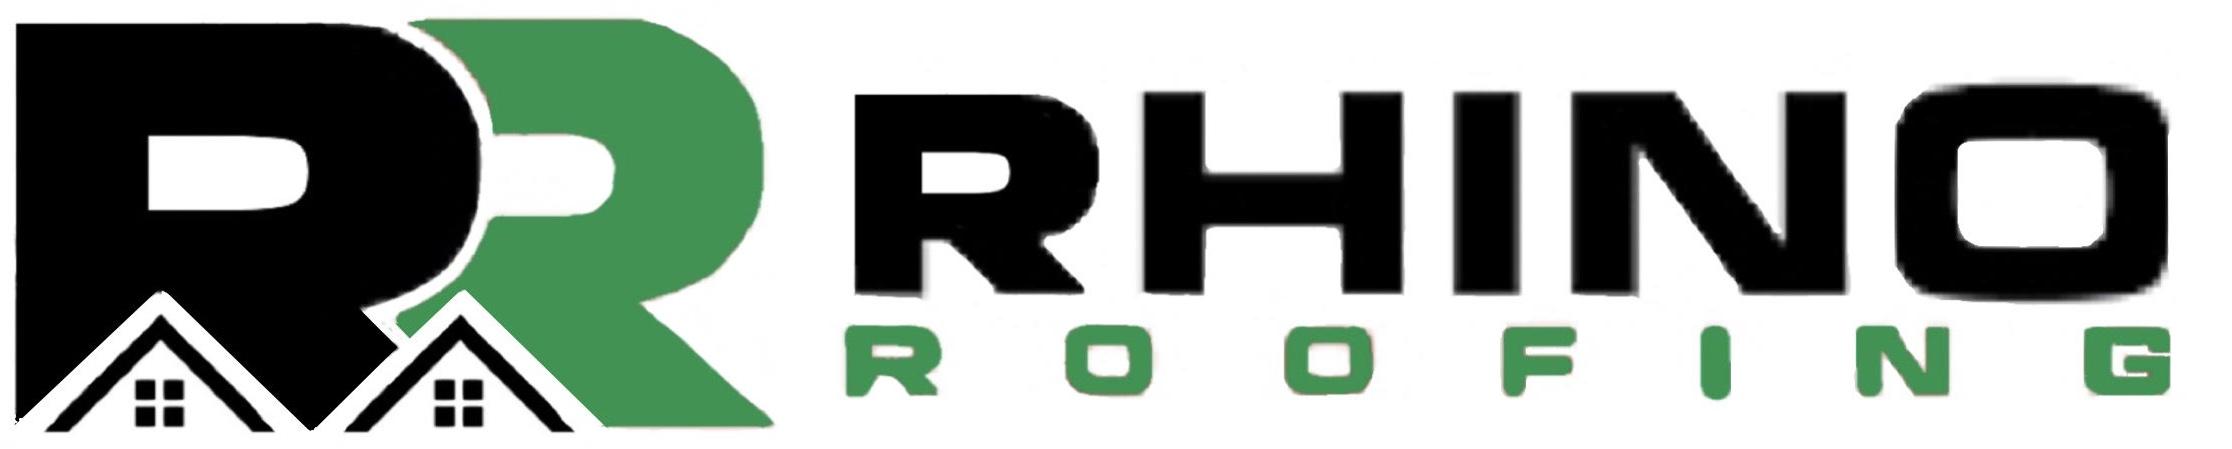 Rhino Roofing NJ